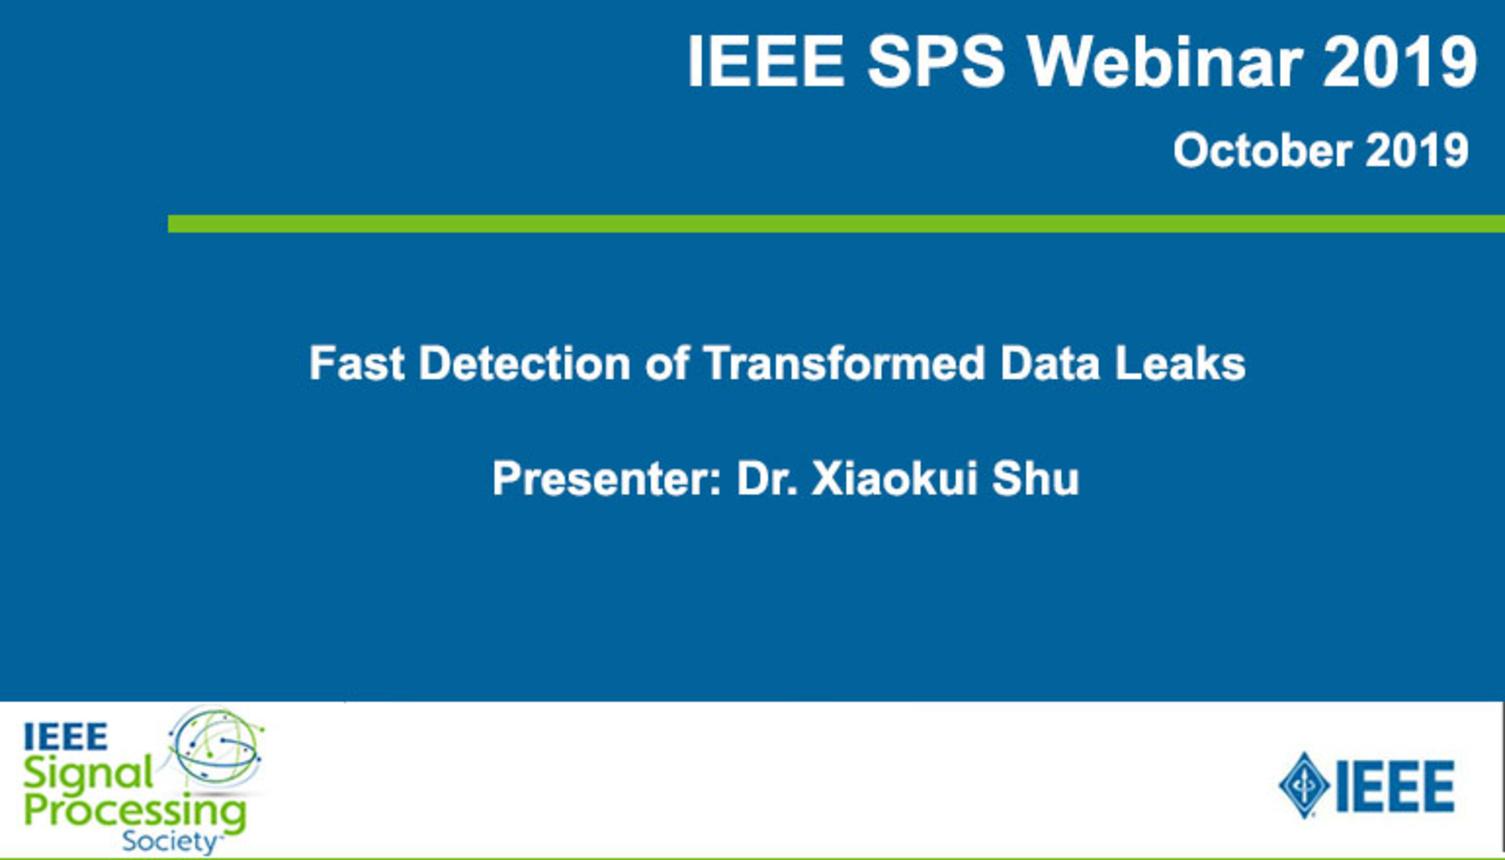 Fast Detection of Transformed Data Leaks